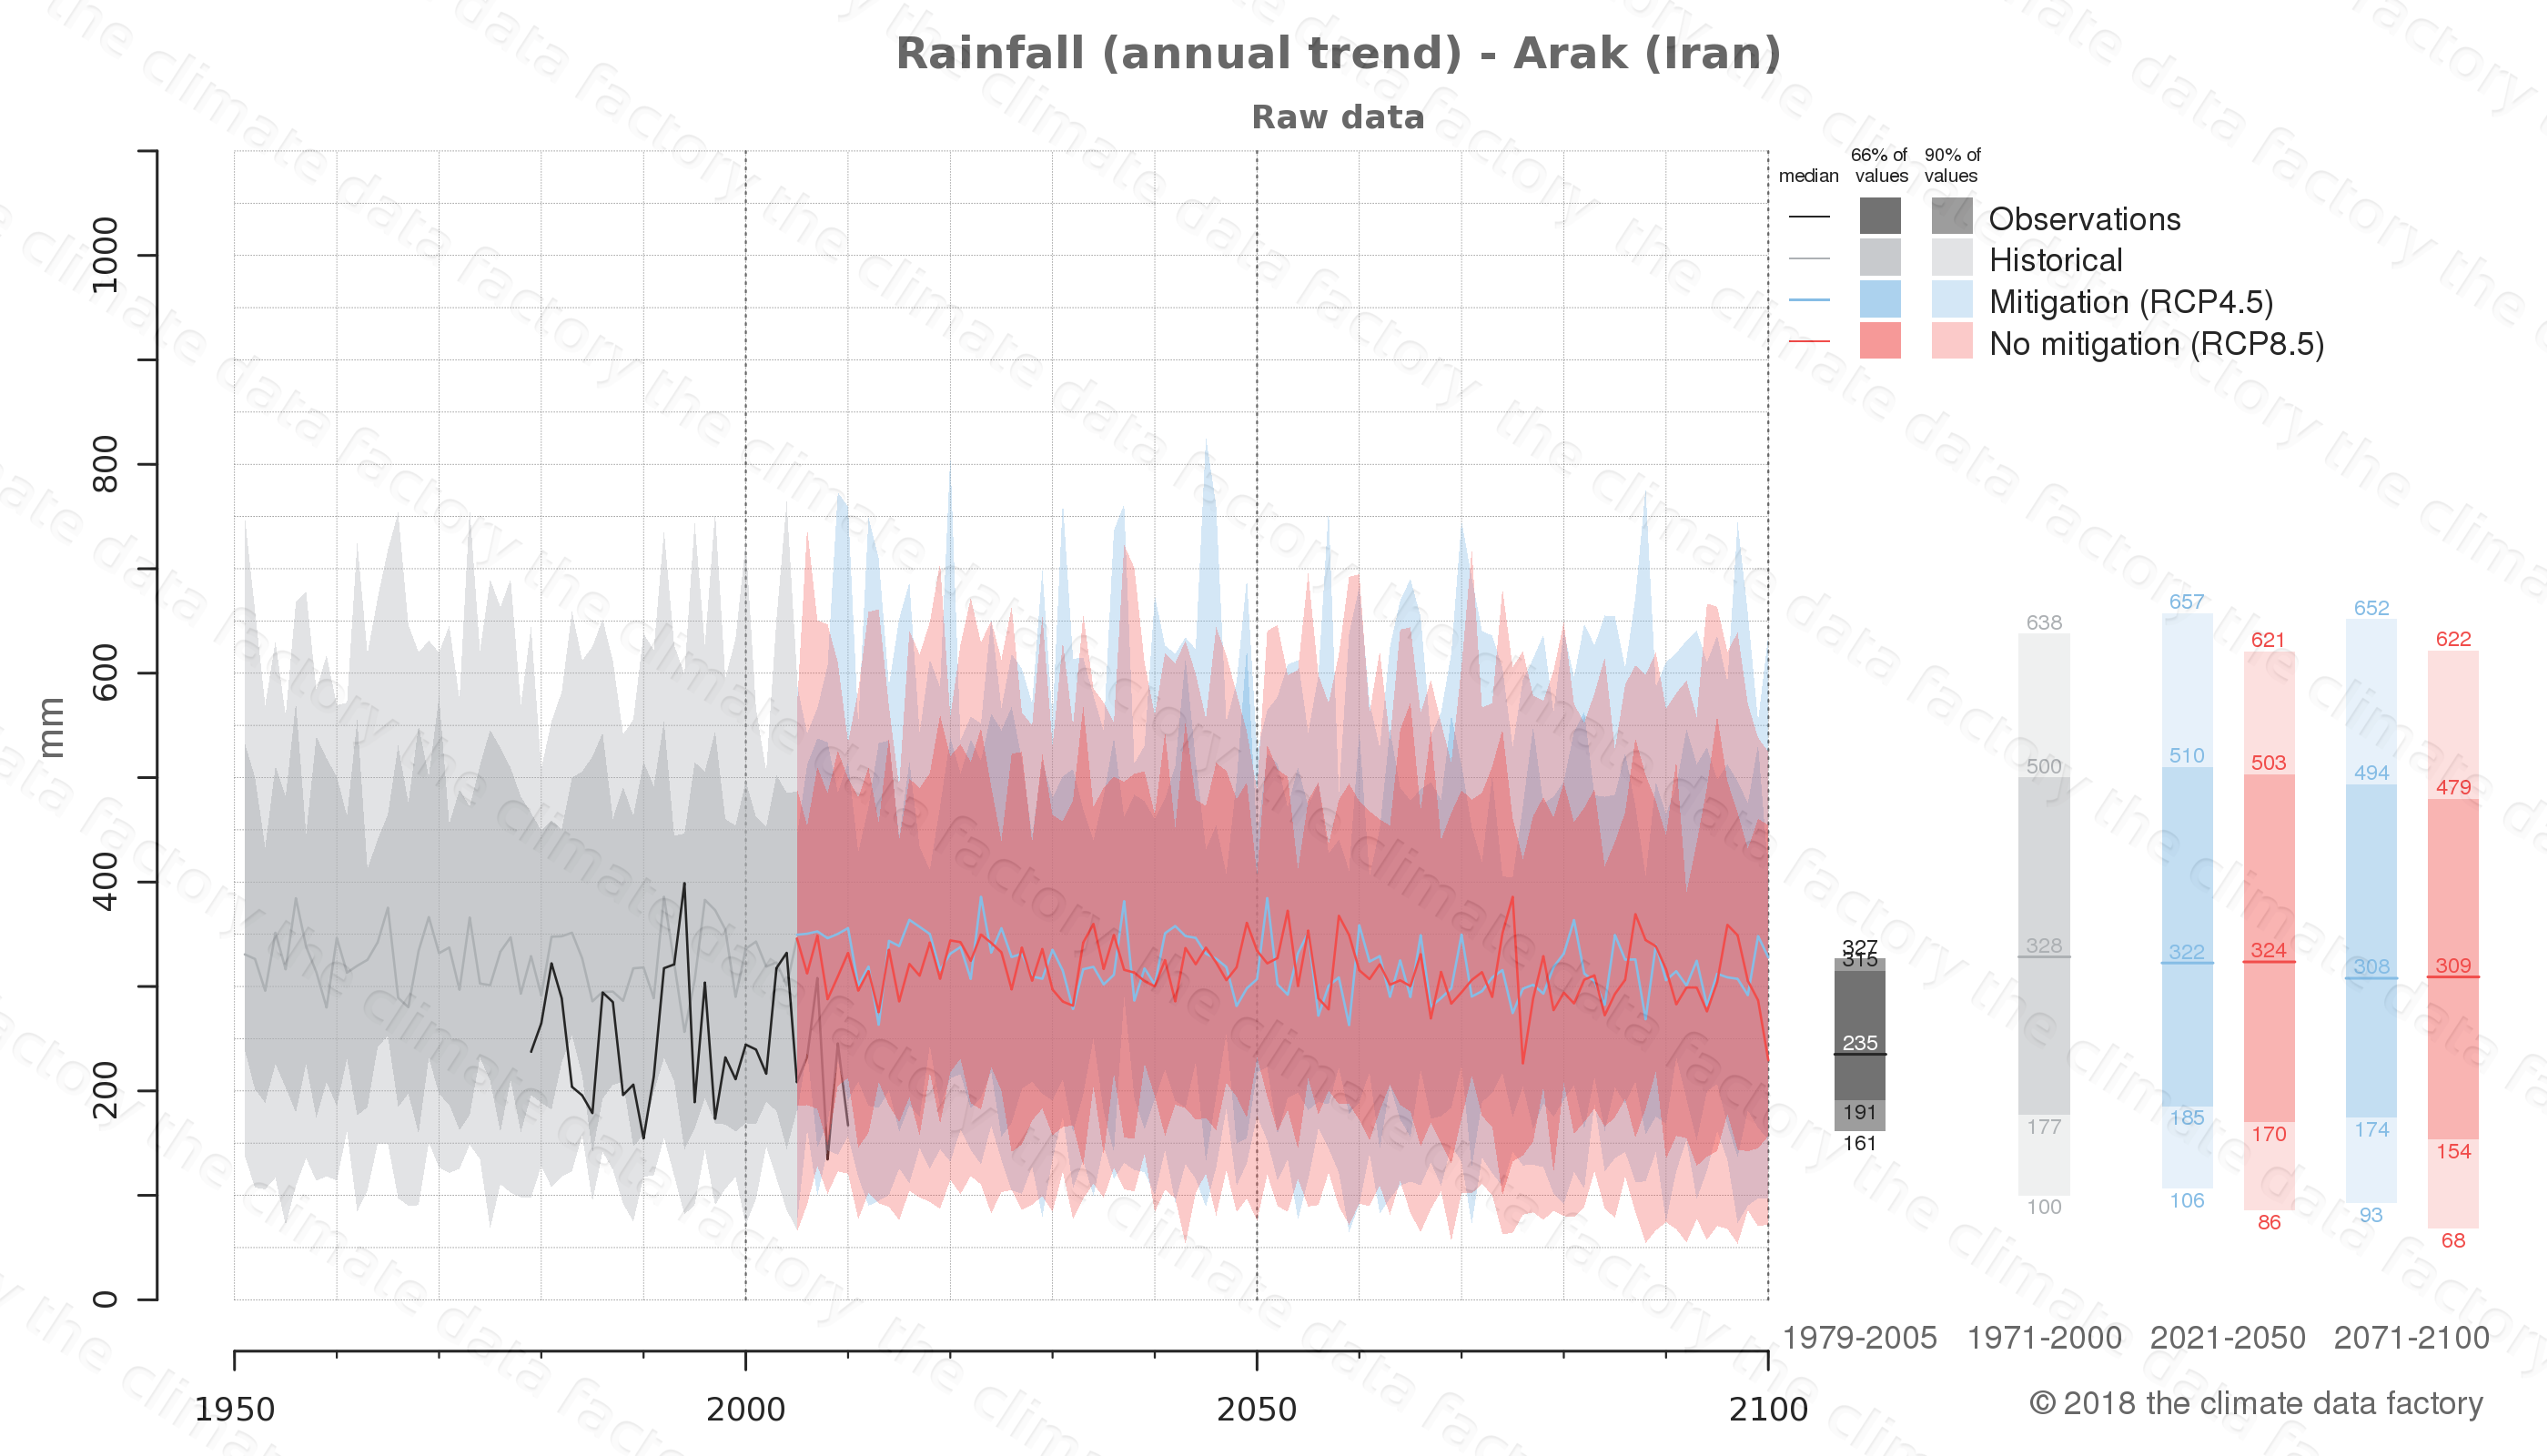 climate change data policy adaptation climate graph city data rainfall arak iran